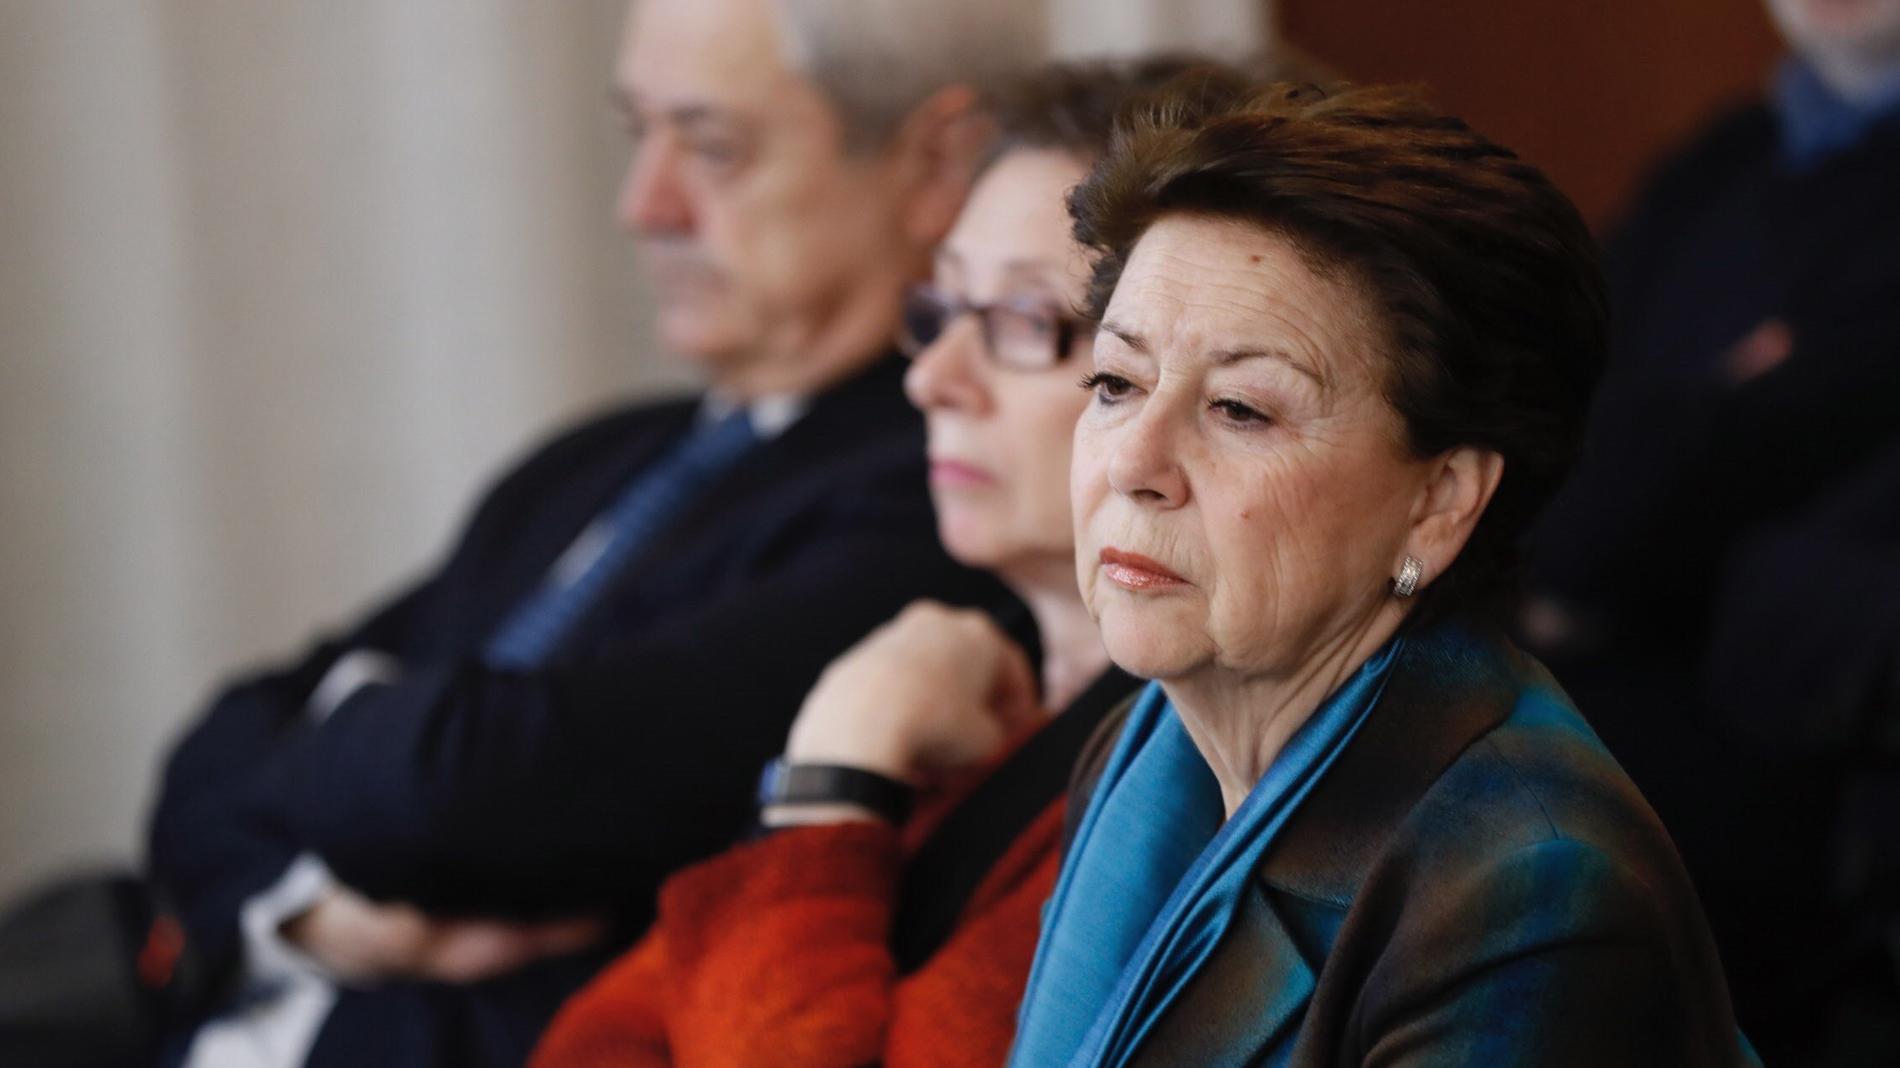 El juez de los ERE interroga a Magdalena Álvarez